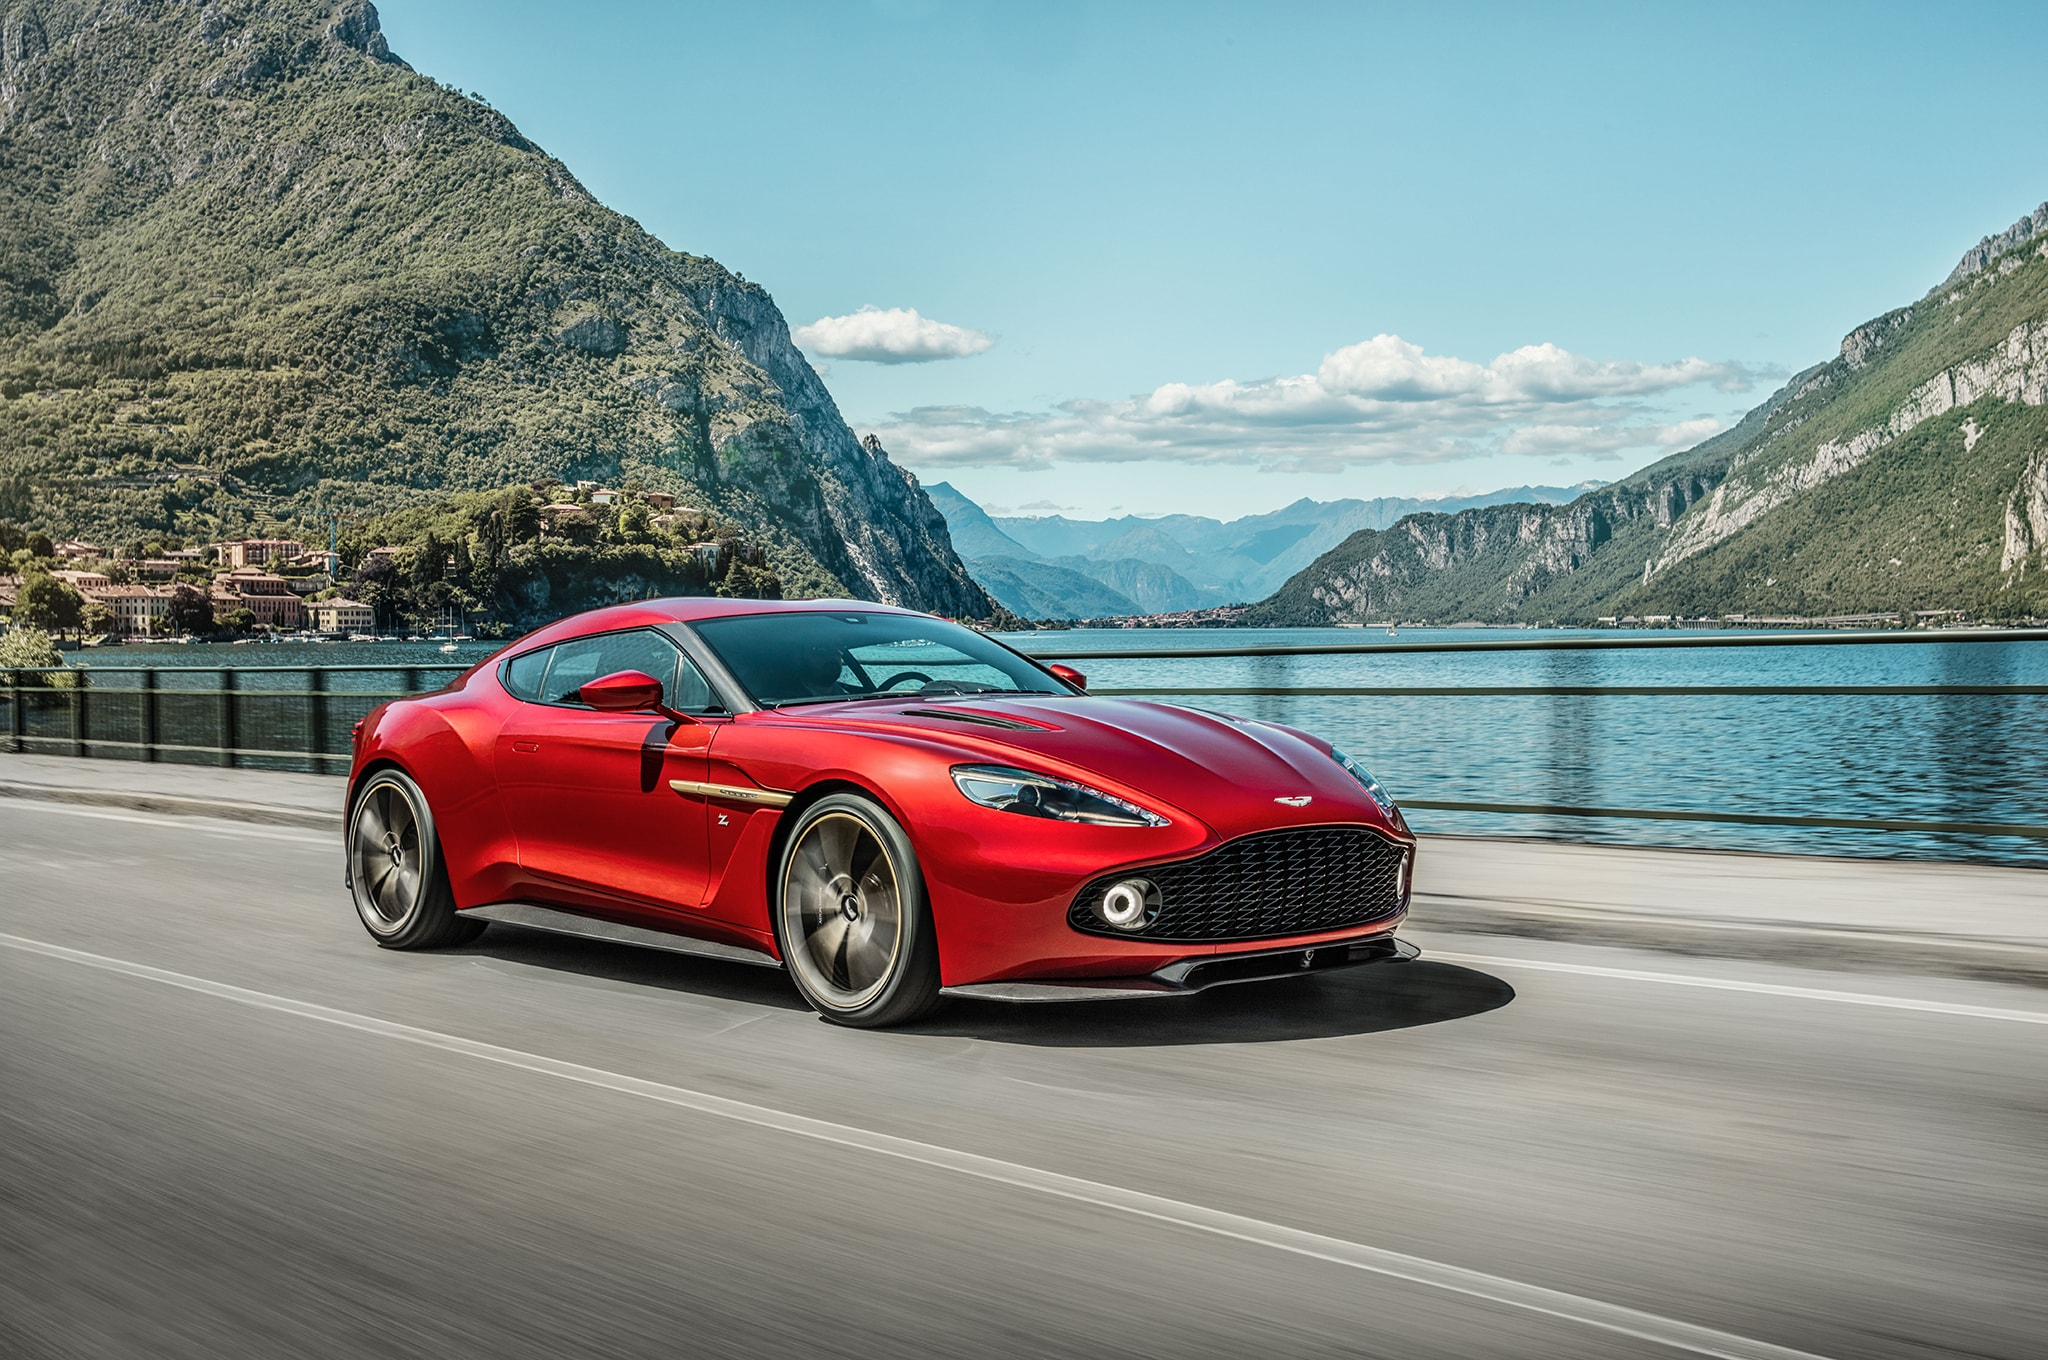 Aston Martin DB Lagonda Wallpapers in jpg format for free